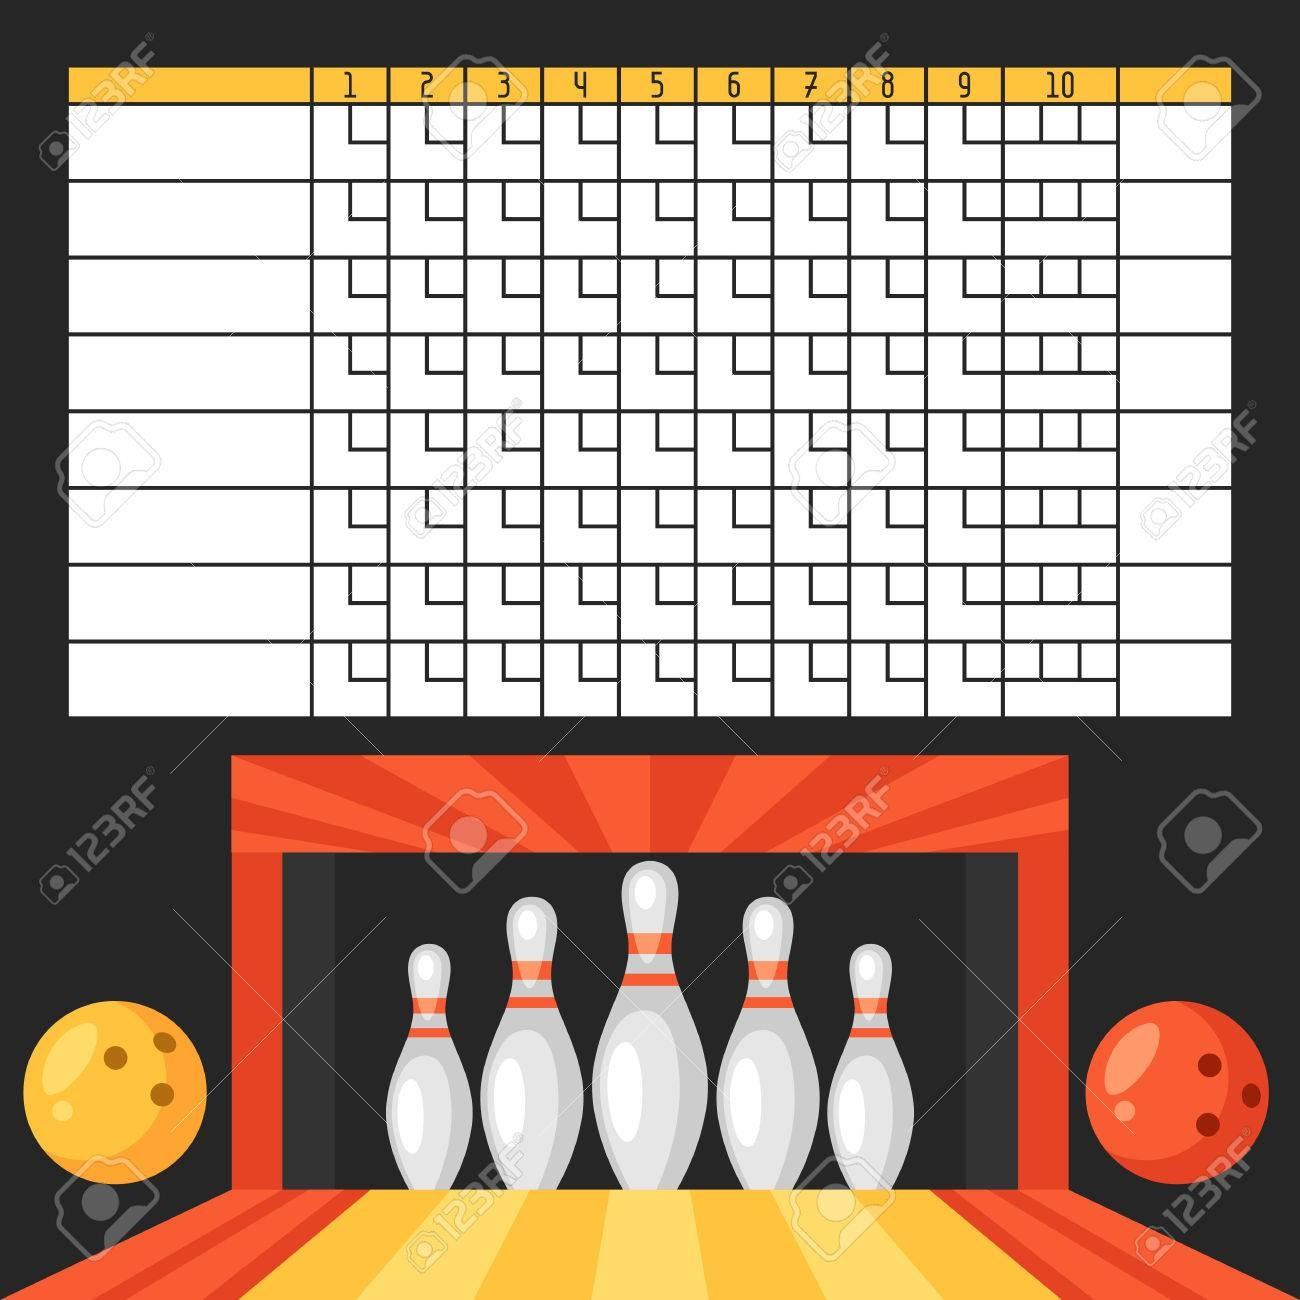 Bowling Score Sheet. Blank Template Scoreboard With Game Objects - Free Printable Bowling Score Sheets